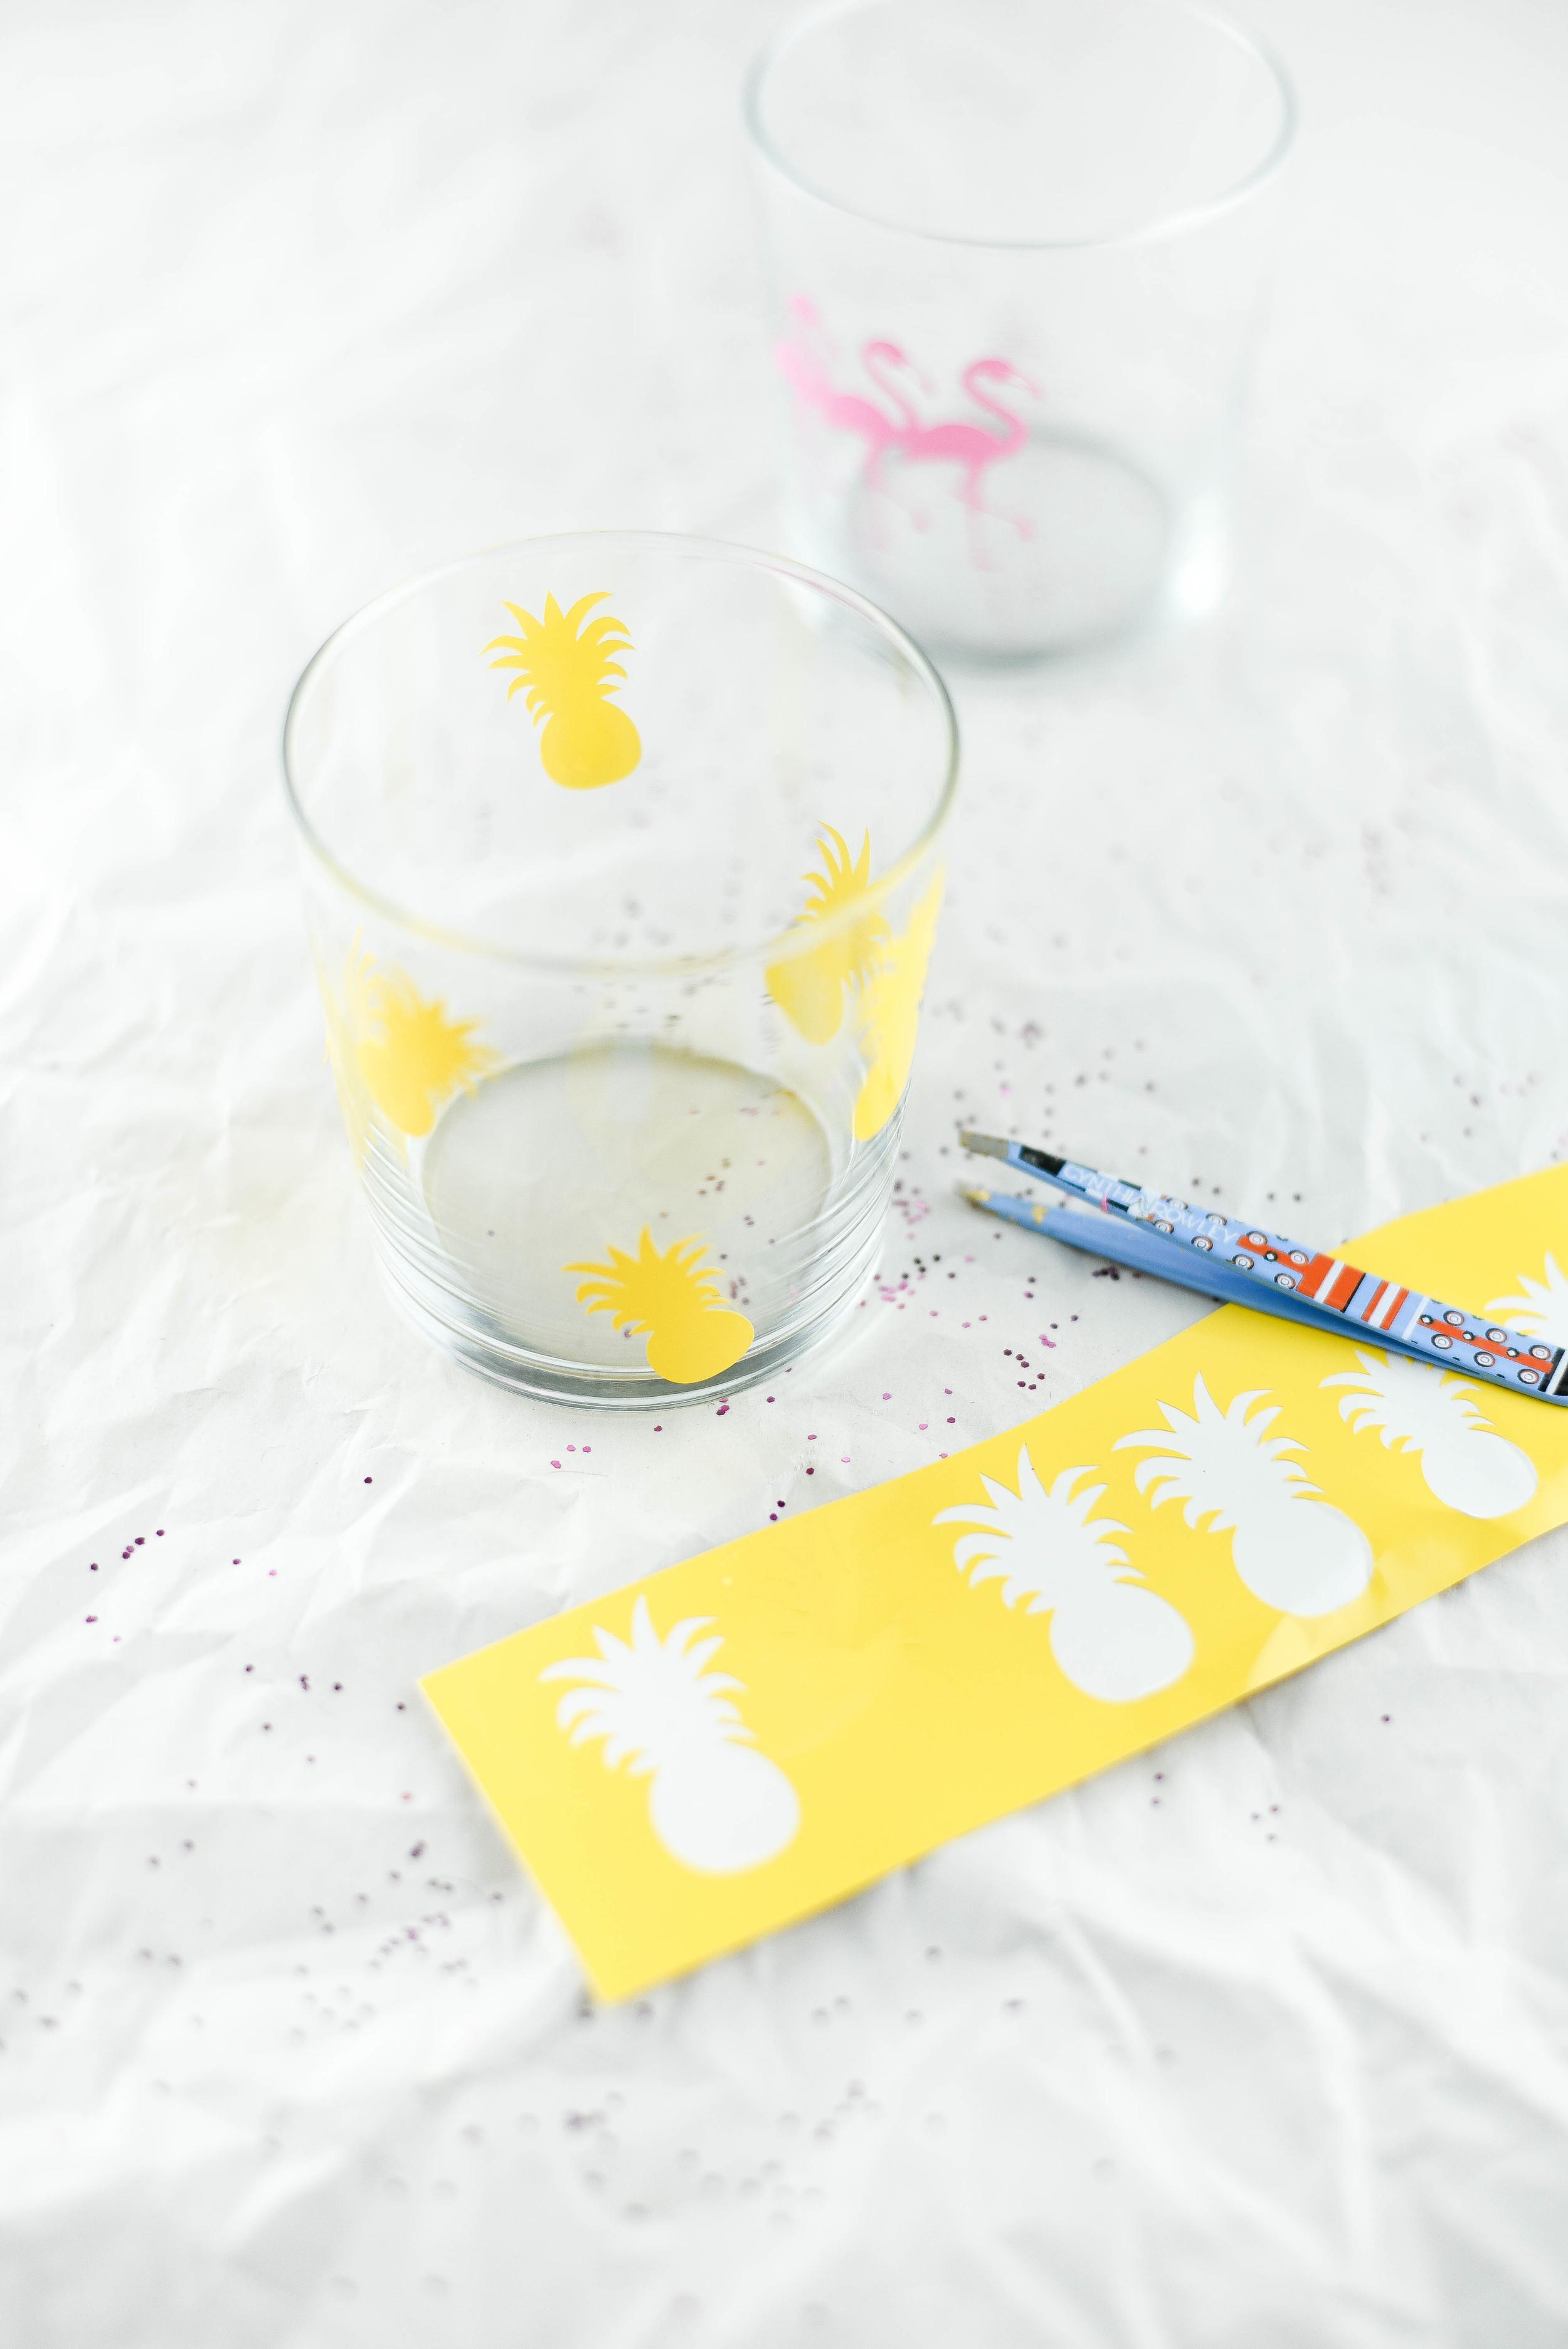 Super cute party idea - DIY flamingo & pineapple glasses with a Cricut! boxwoodavenue.com